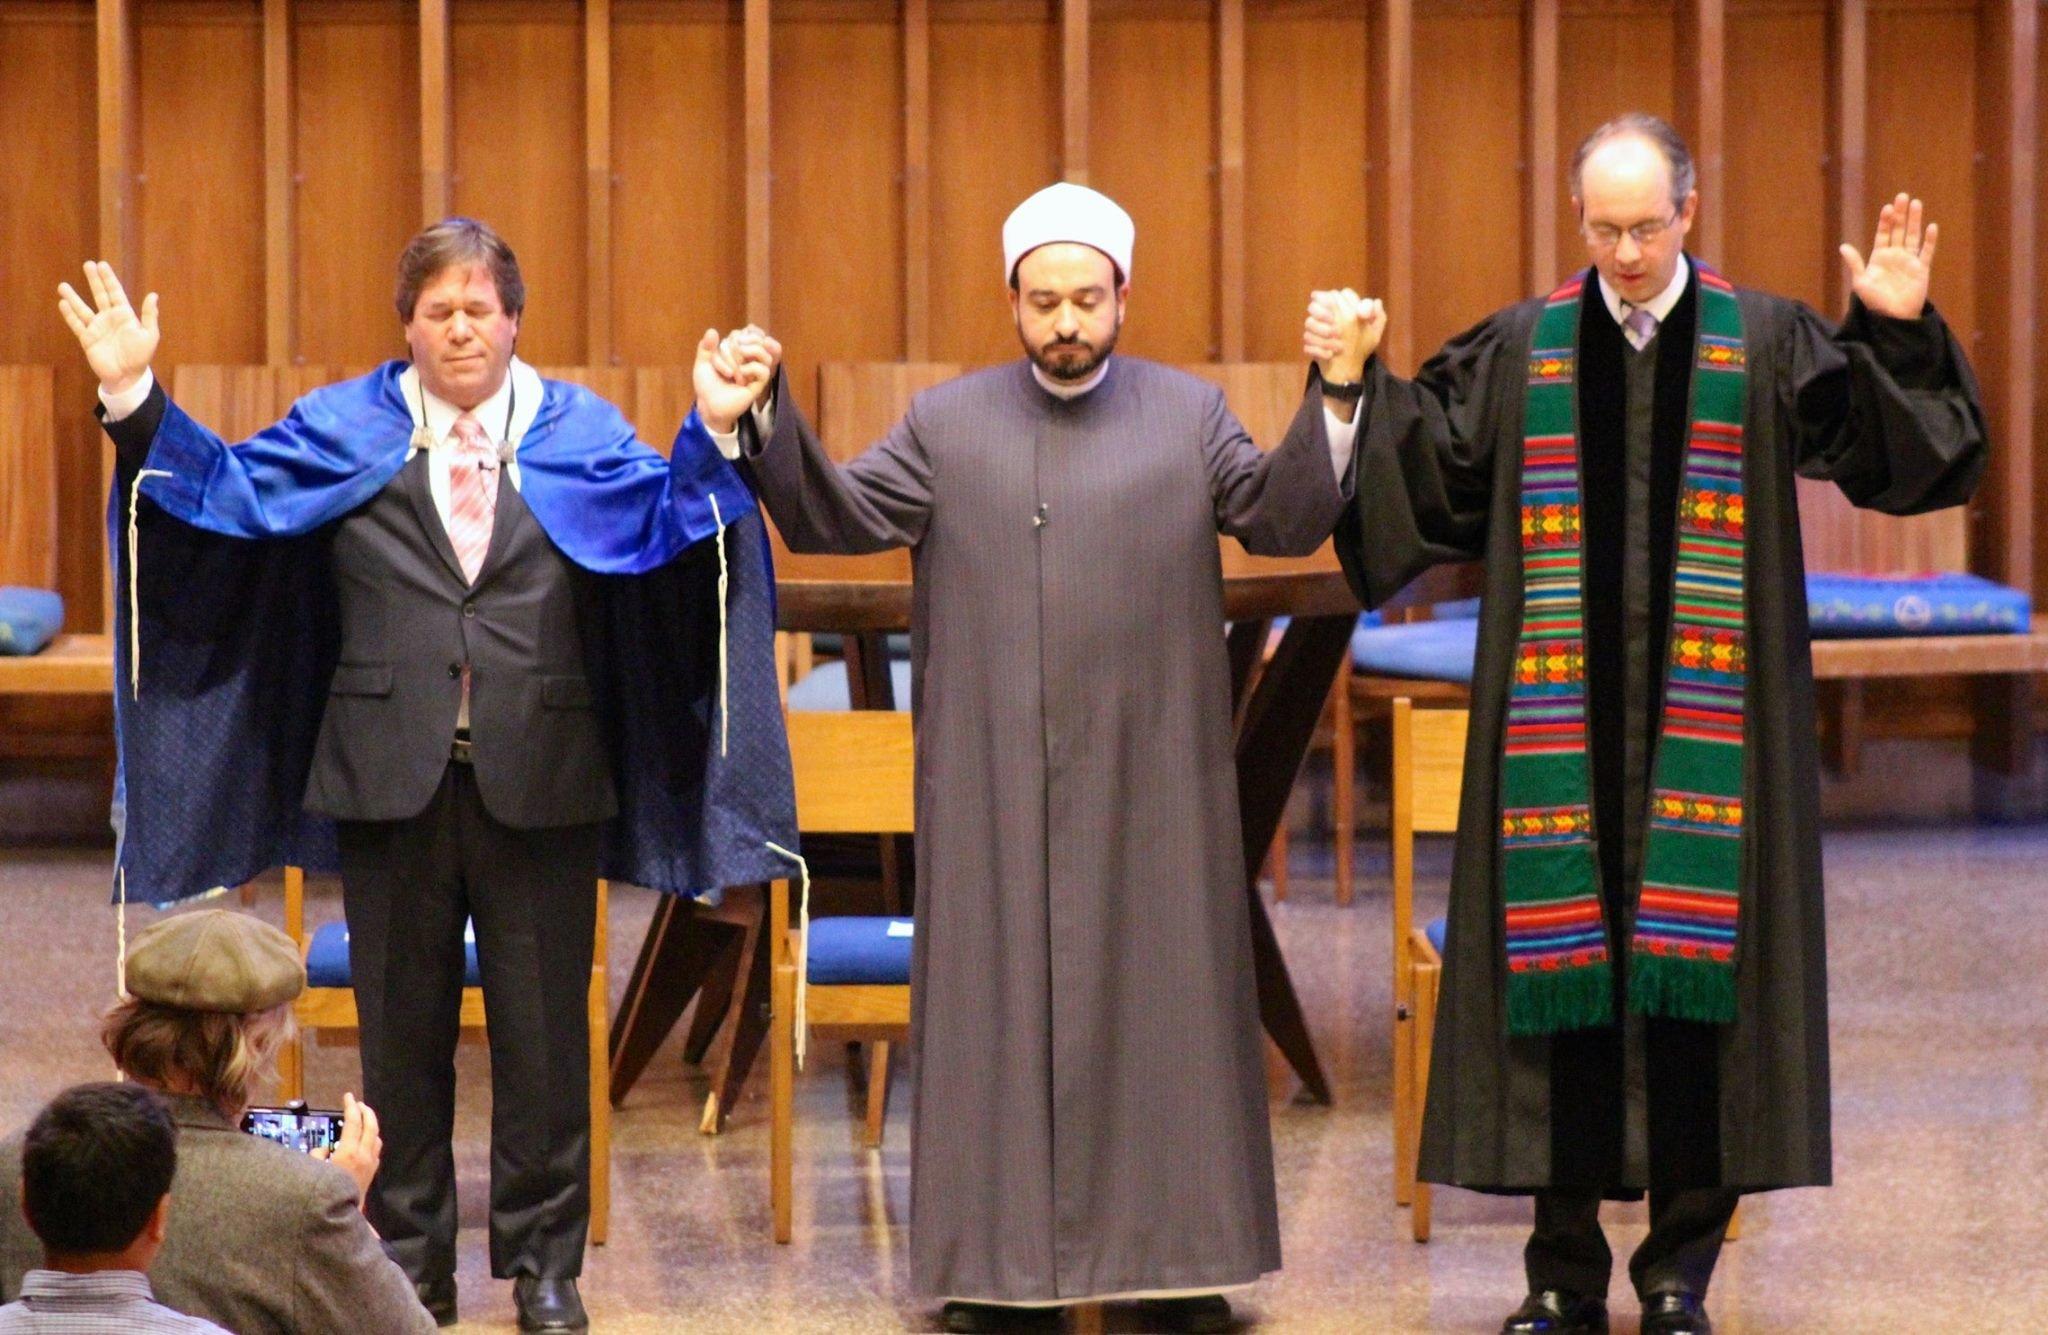 Rabbi Schnitzer, Dr. Tarek Elgawhary and Pastor David Gray pray together during an interfaith service atBradley Hills P